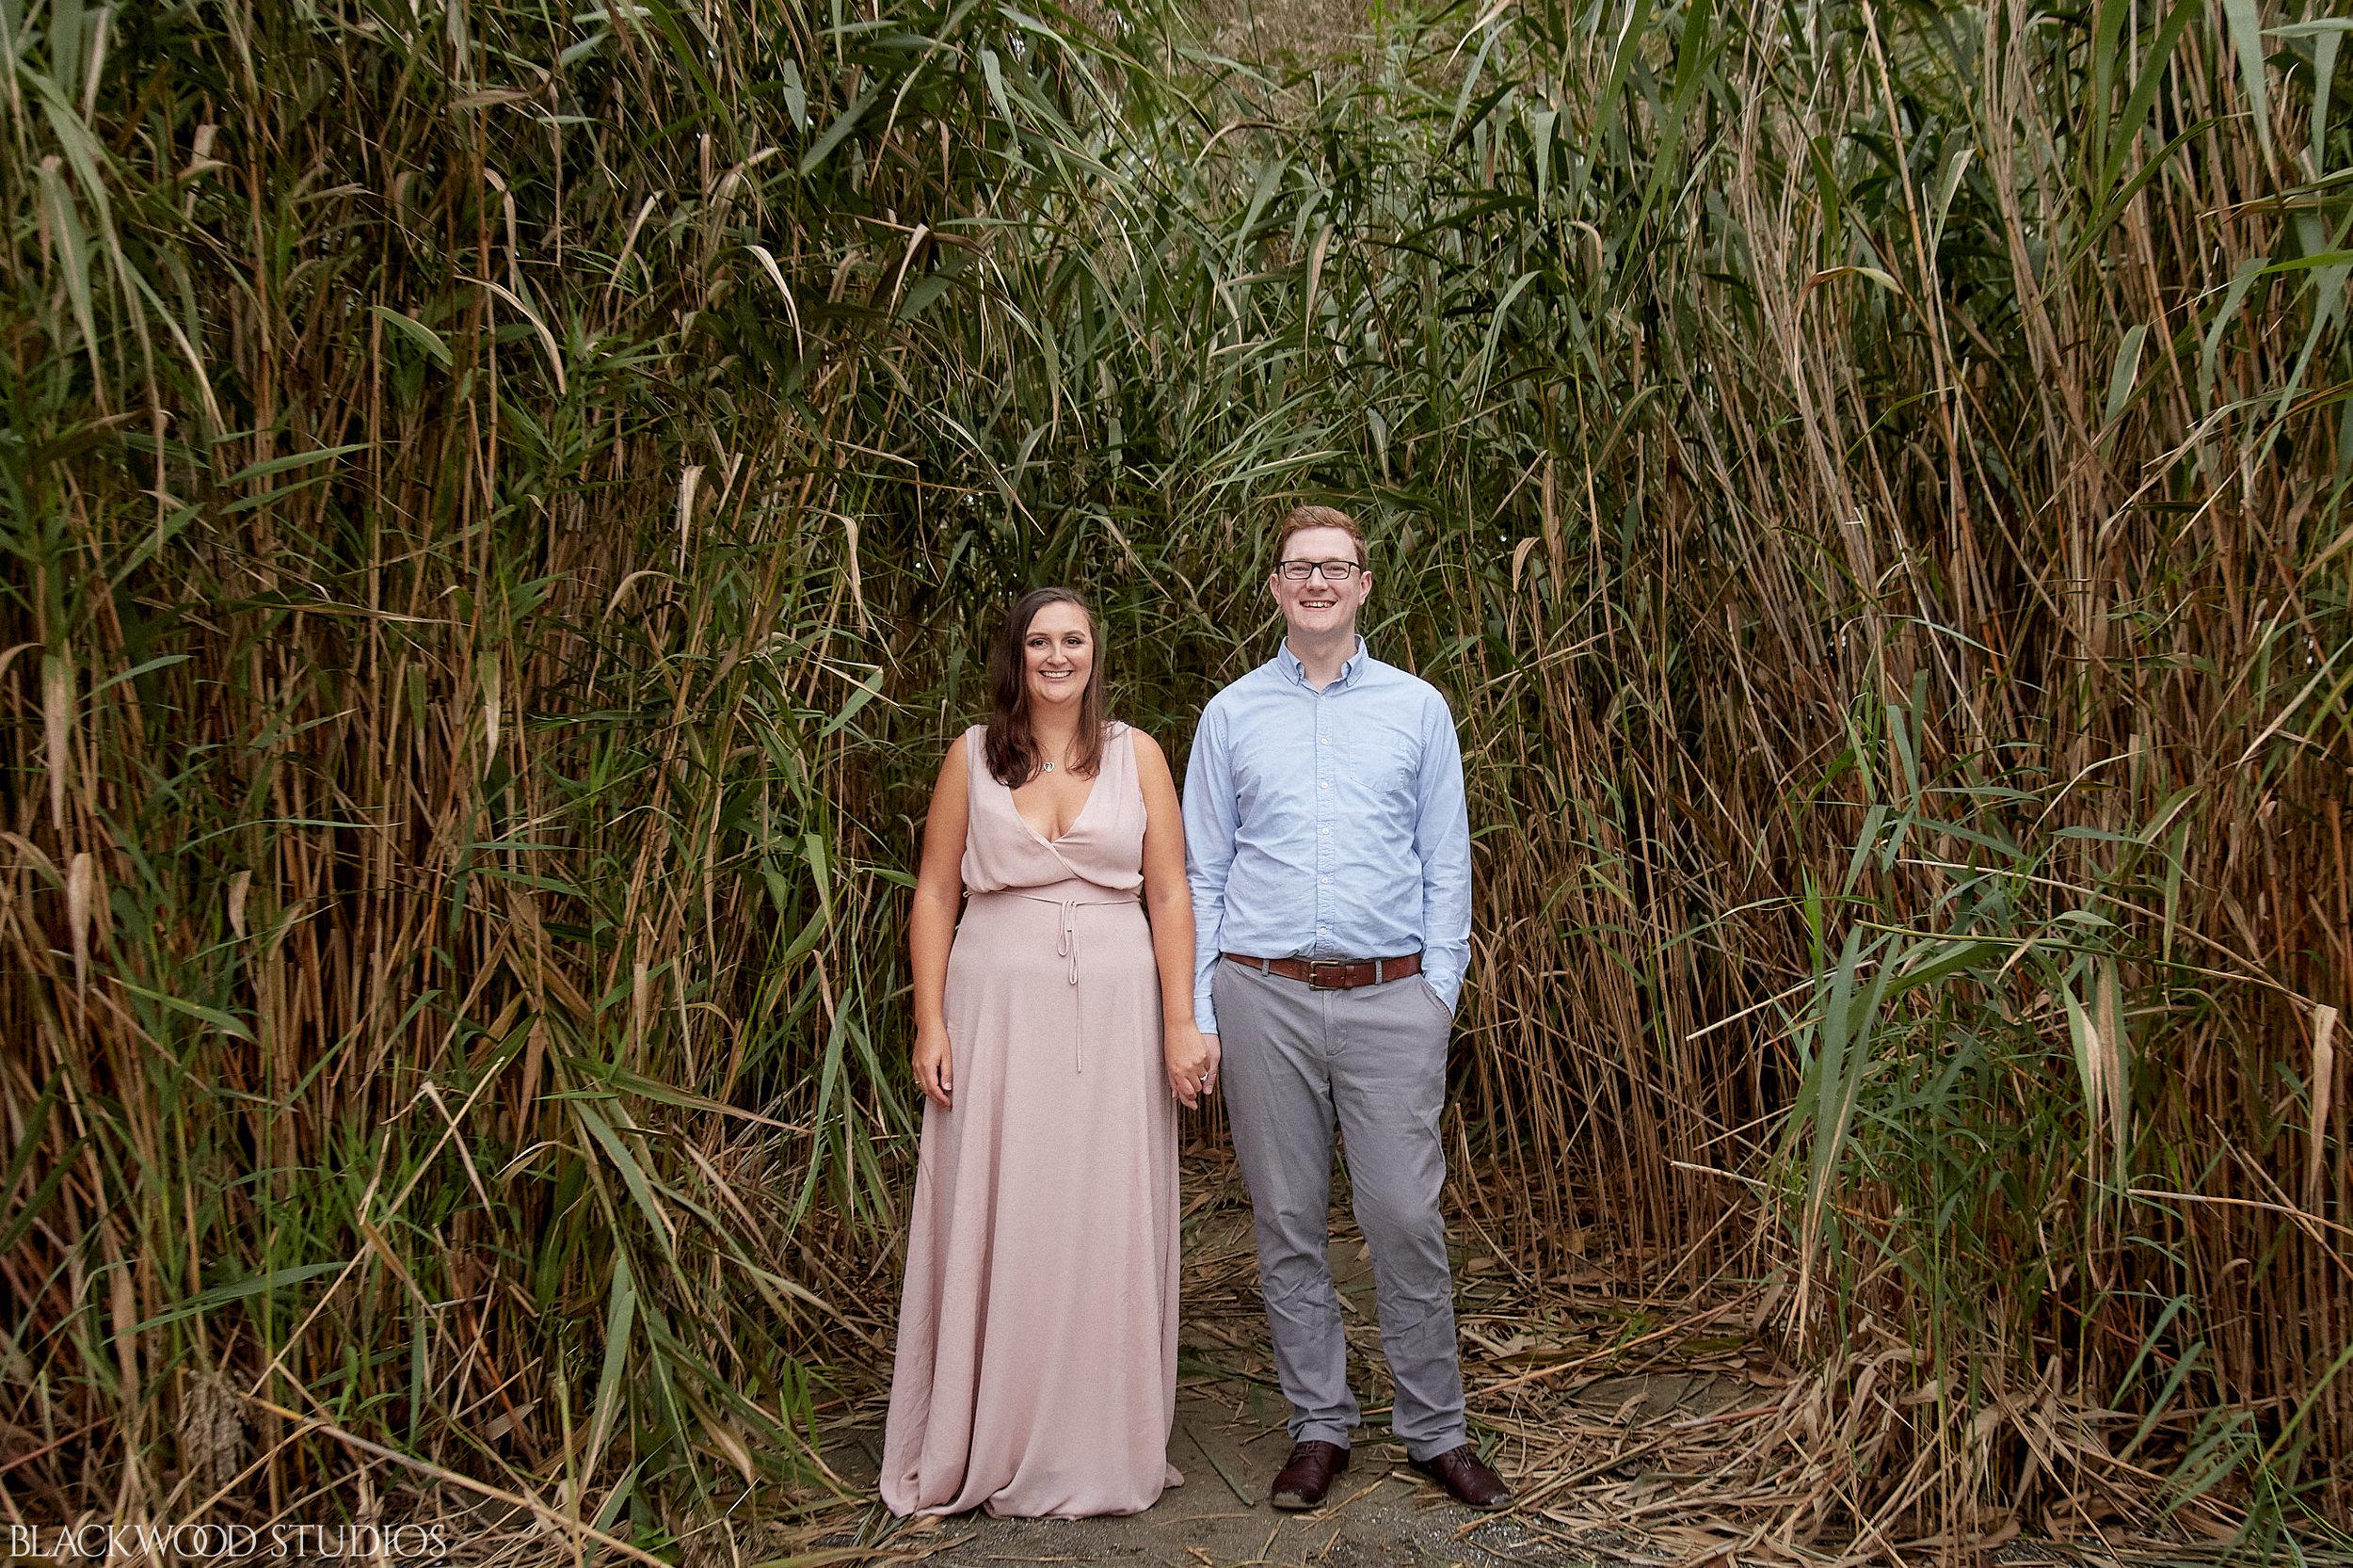 Blackwood-Studios-20181008-17-50-46-Justin-and-Samantha-Engagement-Photography-foggy-Scaraborough-Bluffs-Park-Ontario.jpg